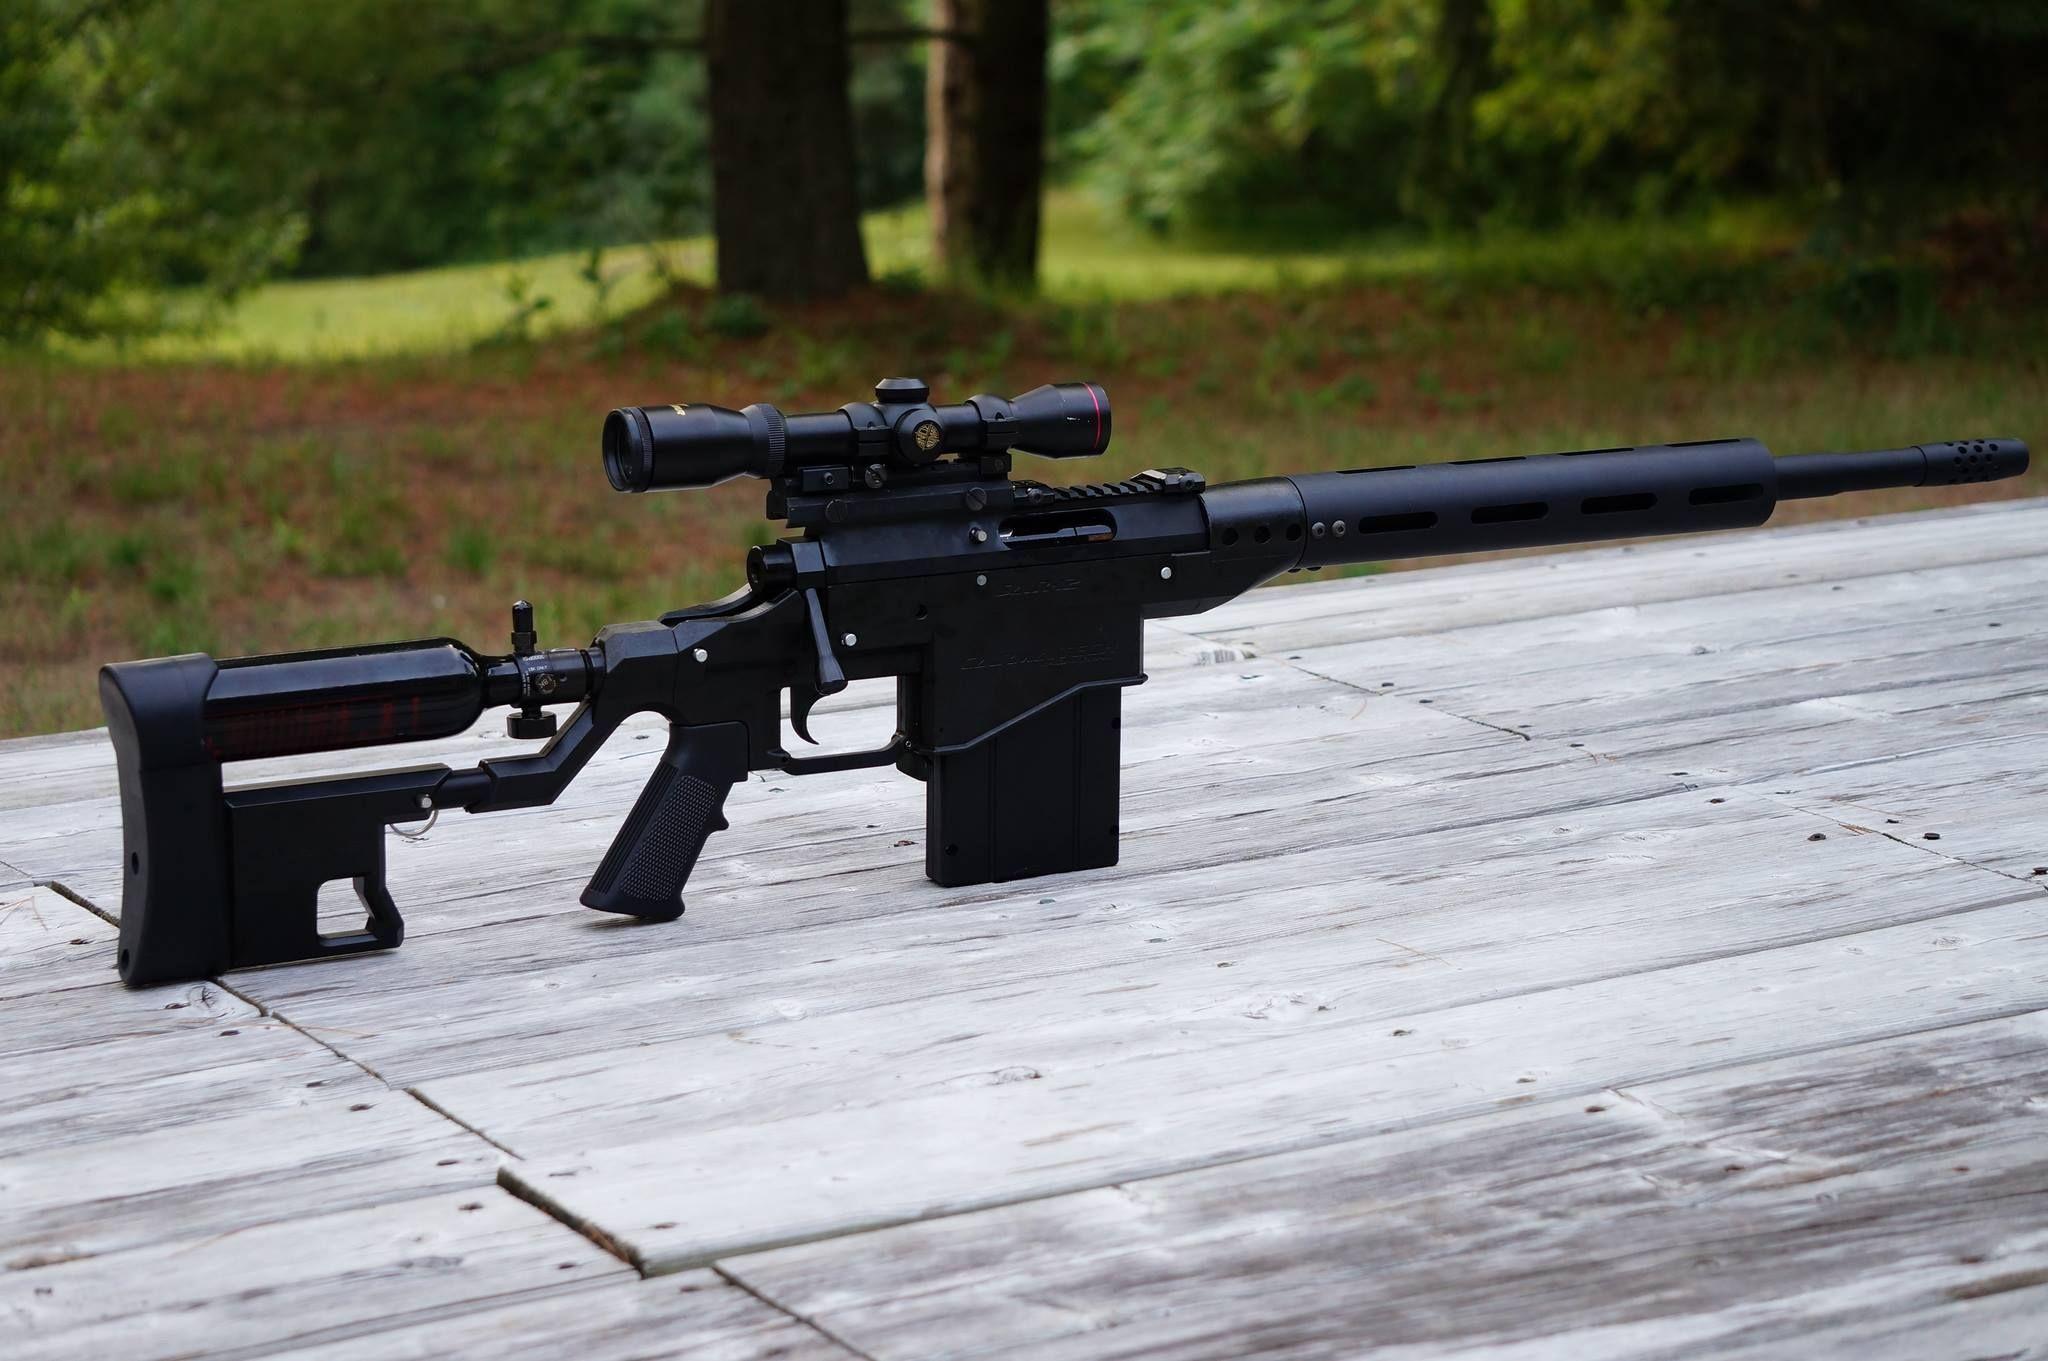 SAR 12 | Tippmann Scenario Guns | Paintball guns, Guns, Paintball gear